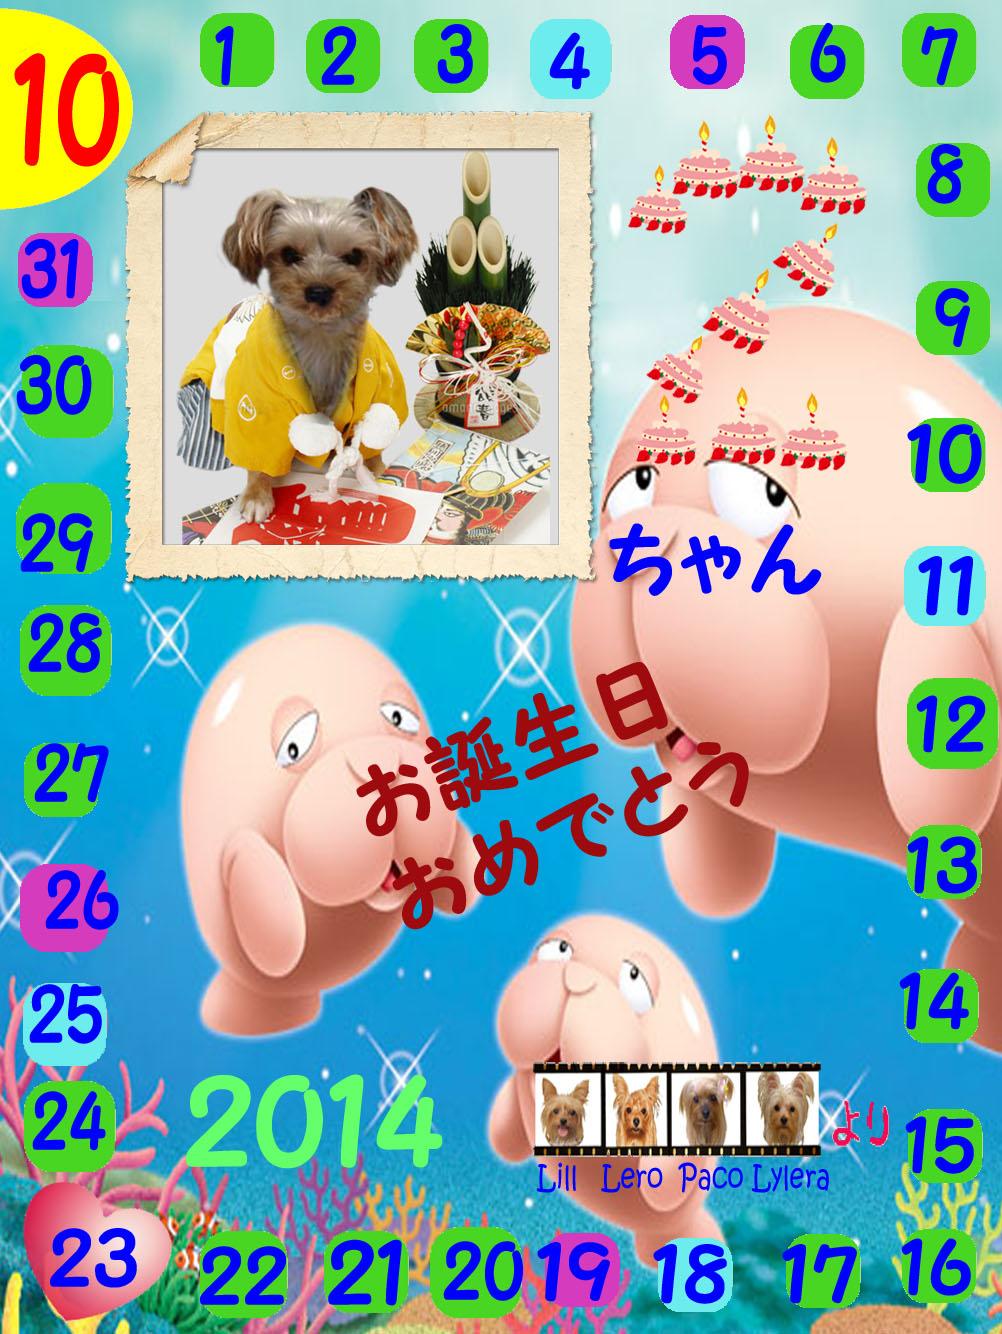 201410251951157e8.jpg